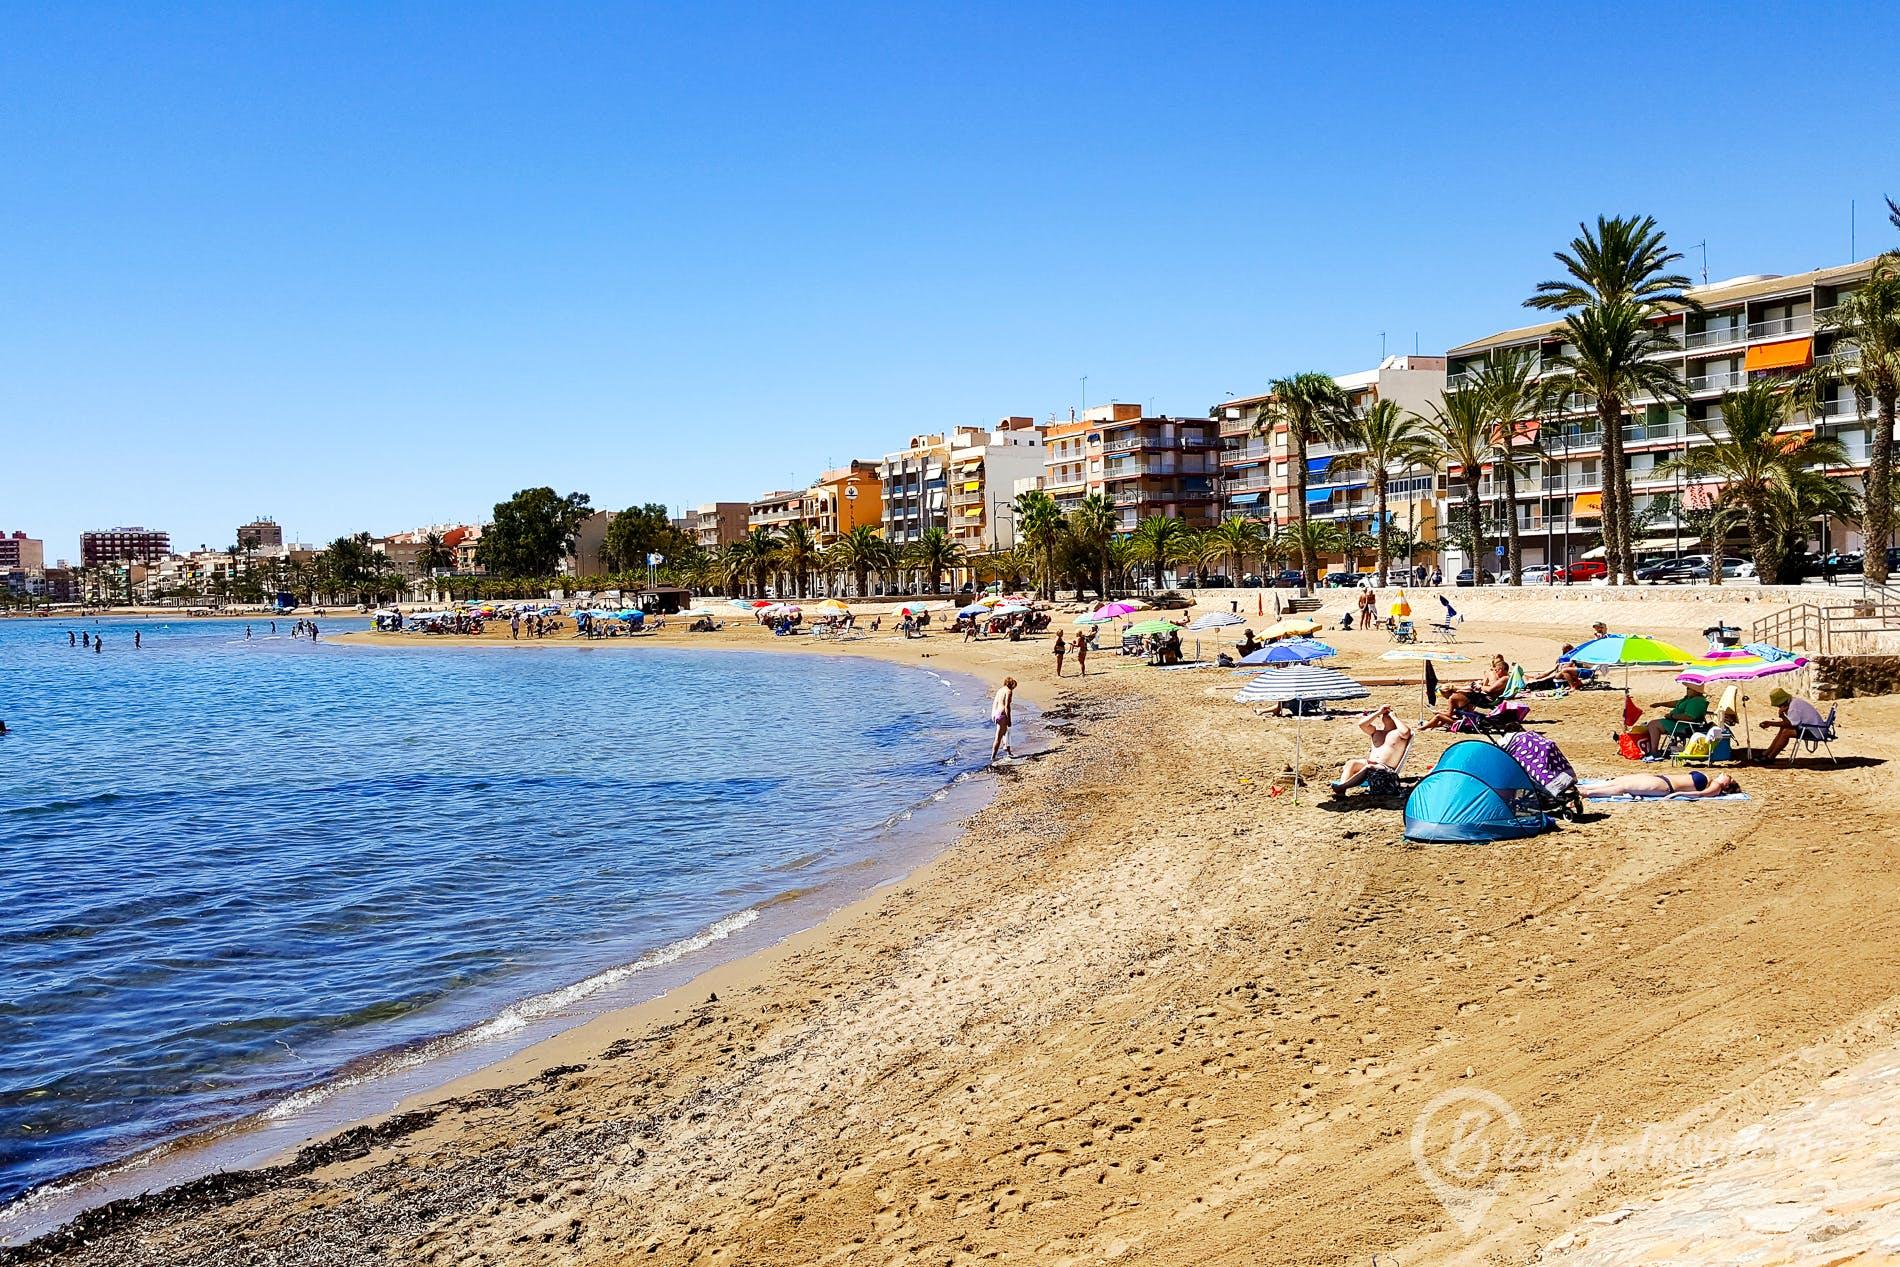 Beach Playa Bahía de Mazarrón, Costa Cálida, Spain